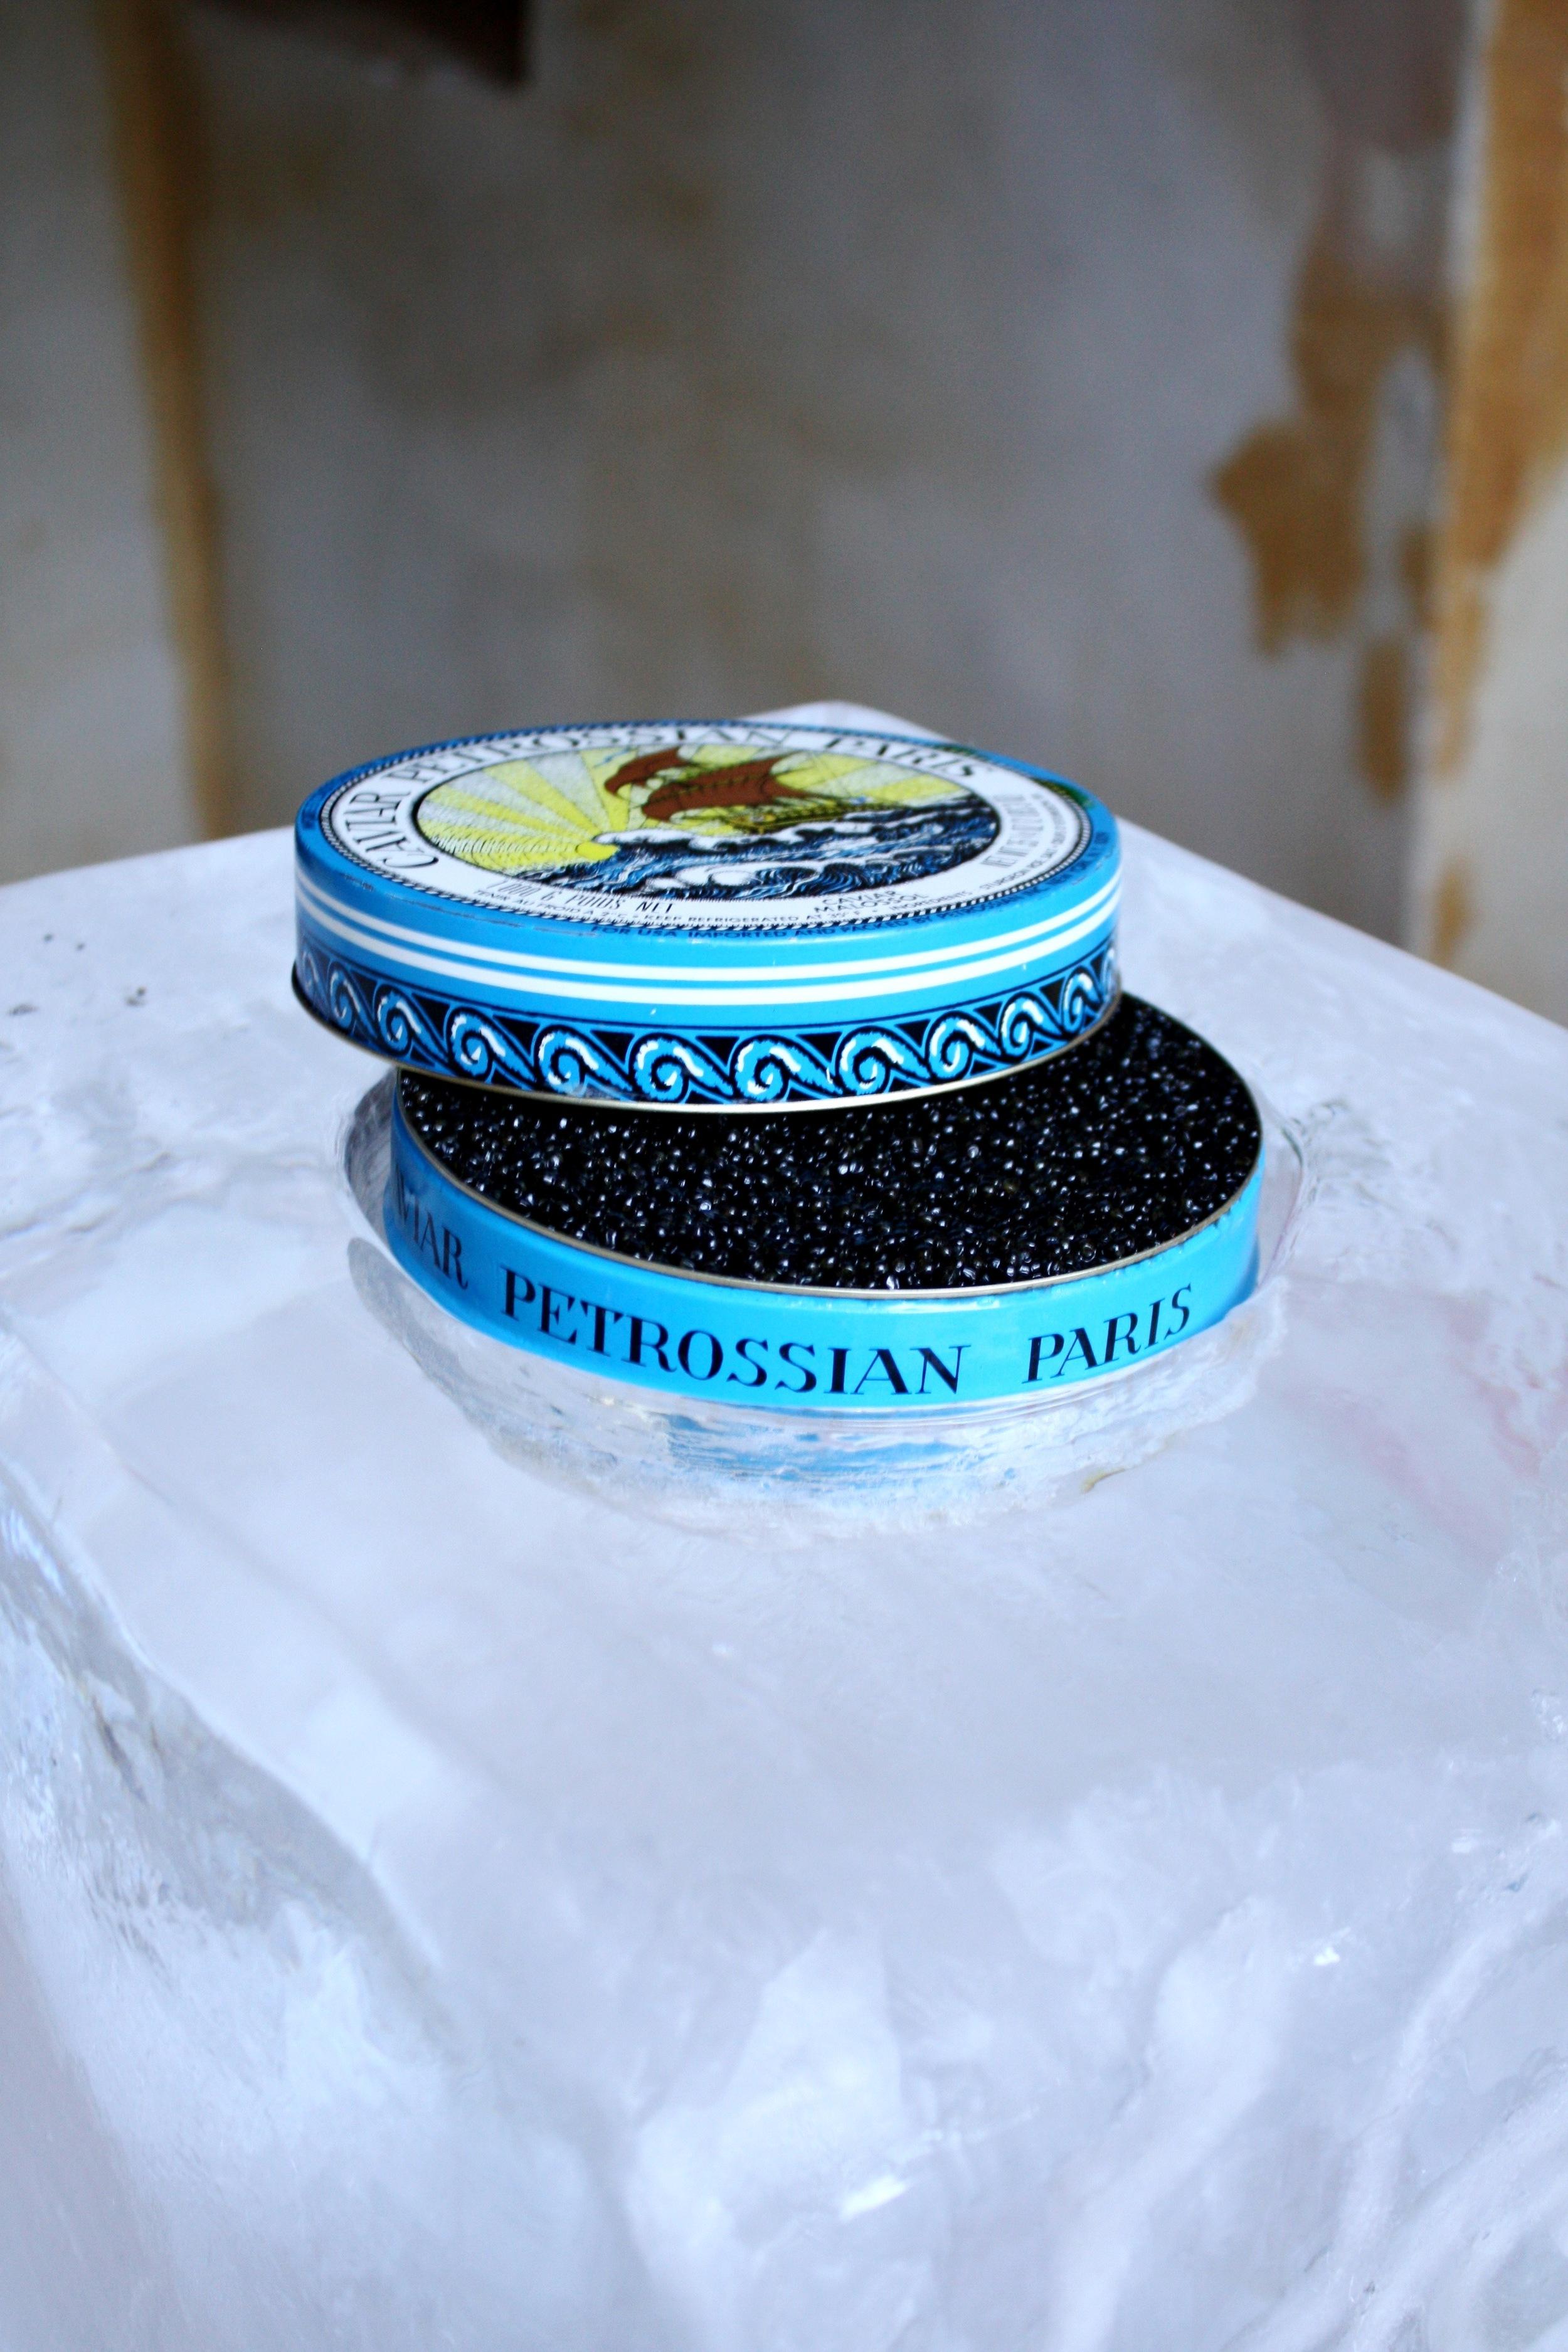 48. LS - caviar display, custom ice blocks for caviar, cocktail hour ideas, ice sculptures, wedding caviar bar .jpg